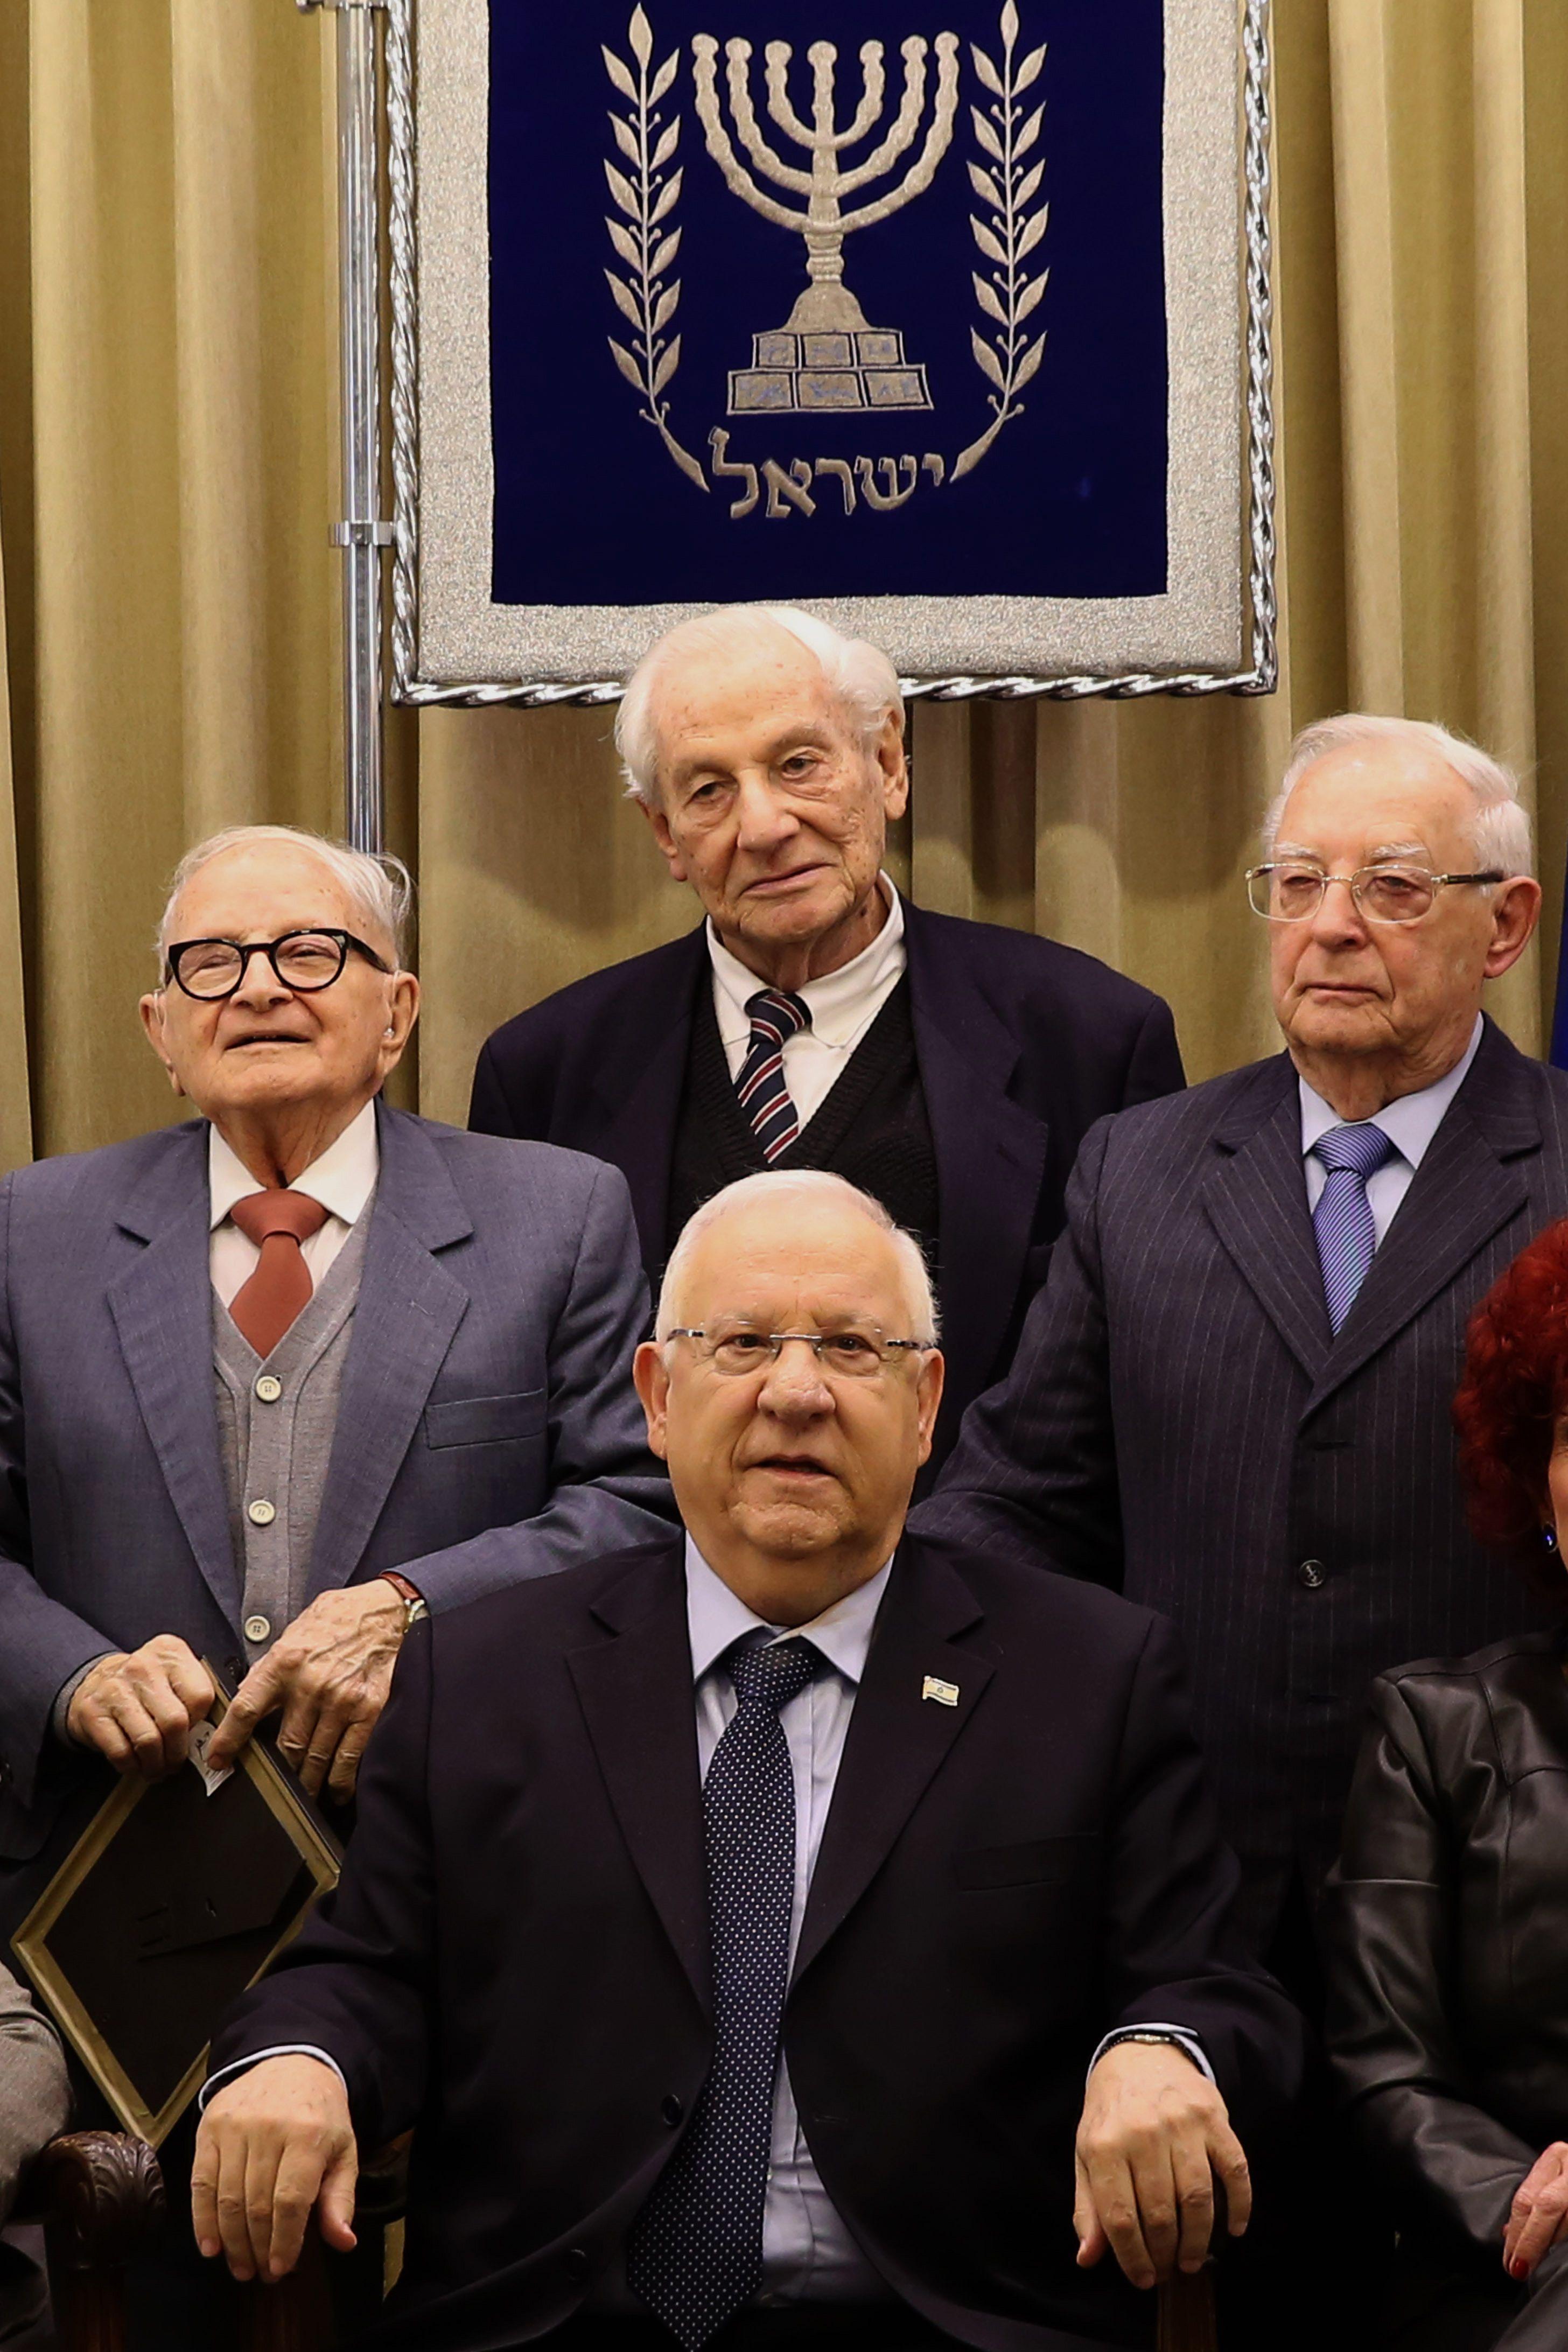 Recuerdo. El presidente Reuven Rivlin (centro) presentó la carta. (NA)